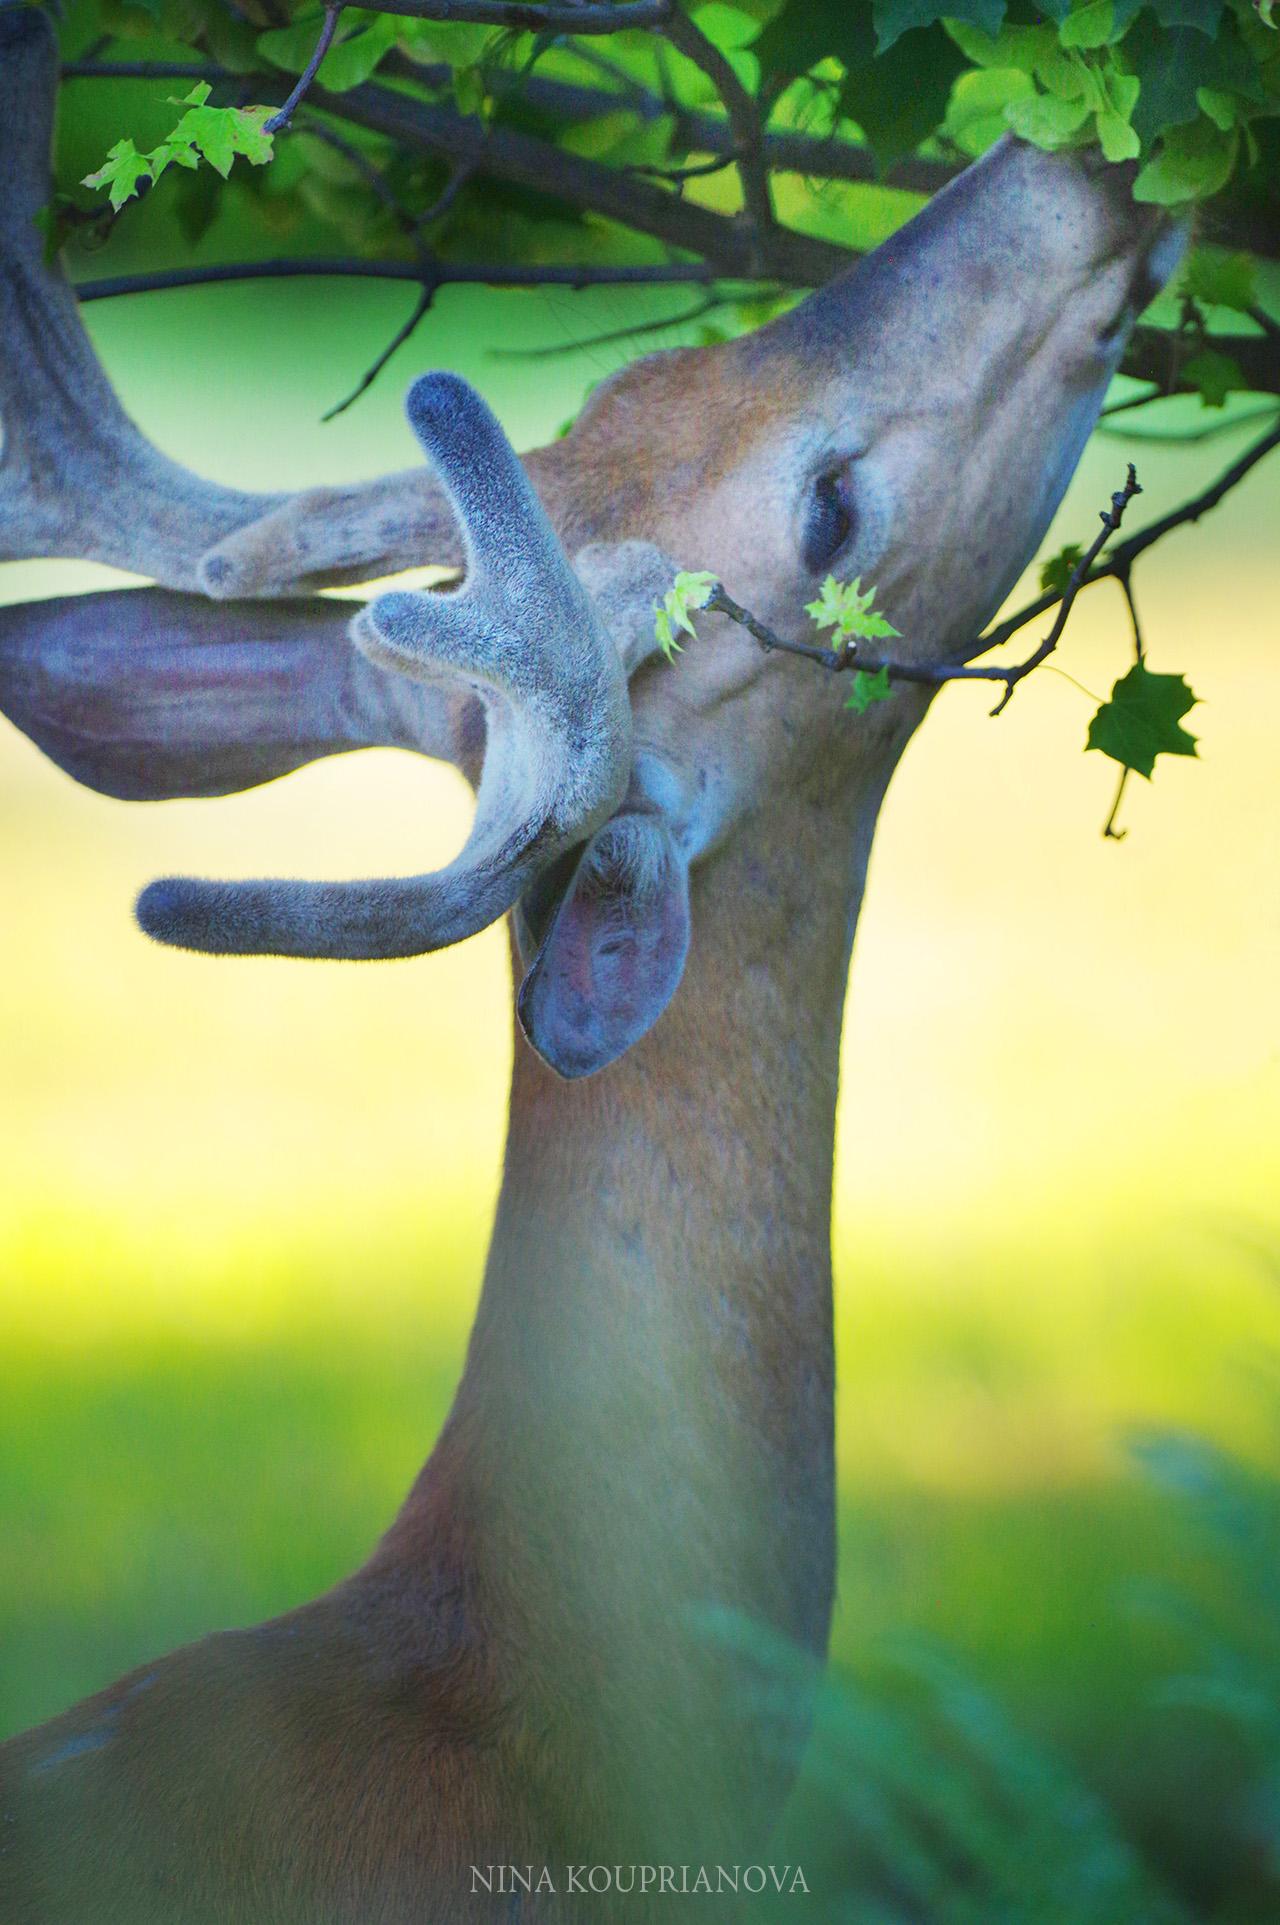 deer feeding july 2018 a 2000 px.jpg